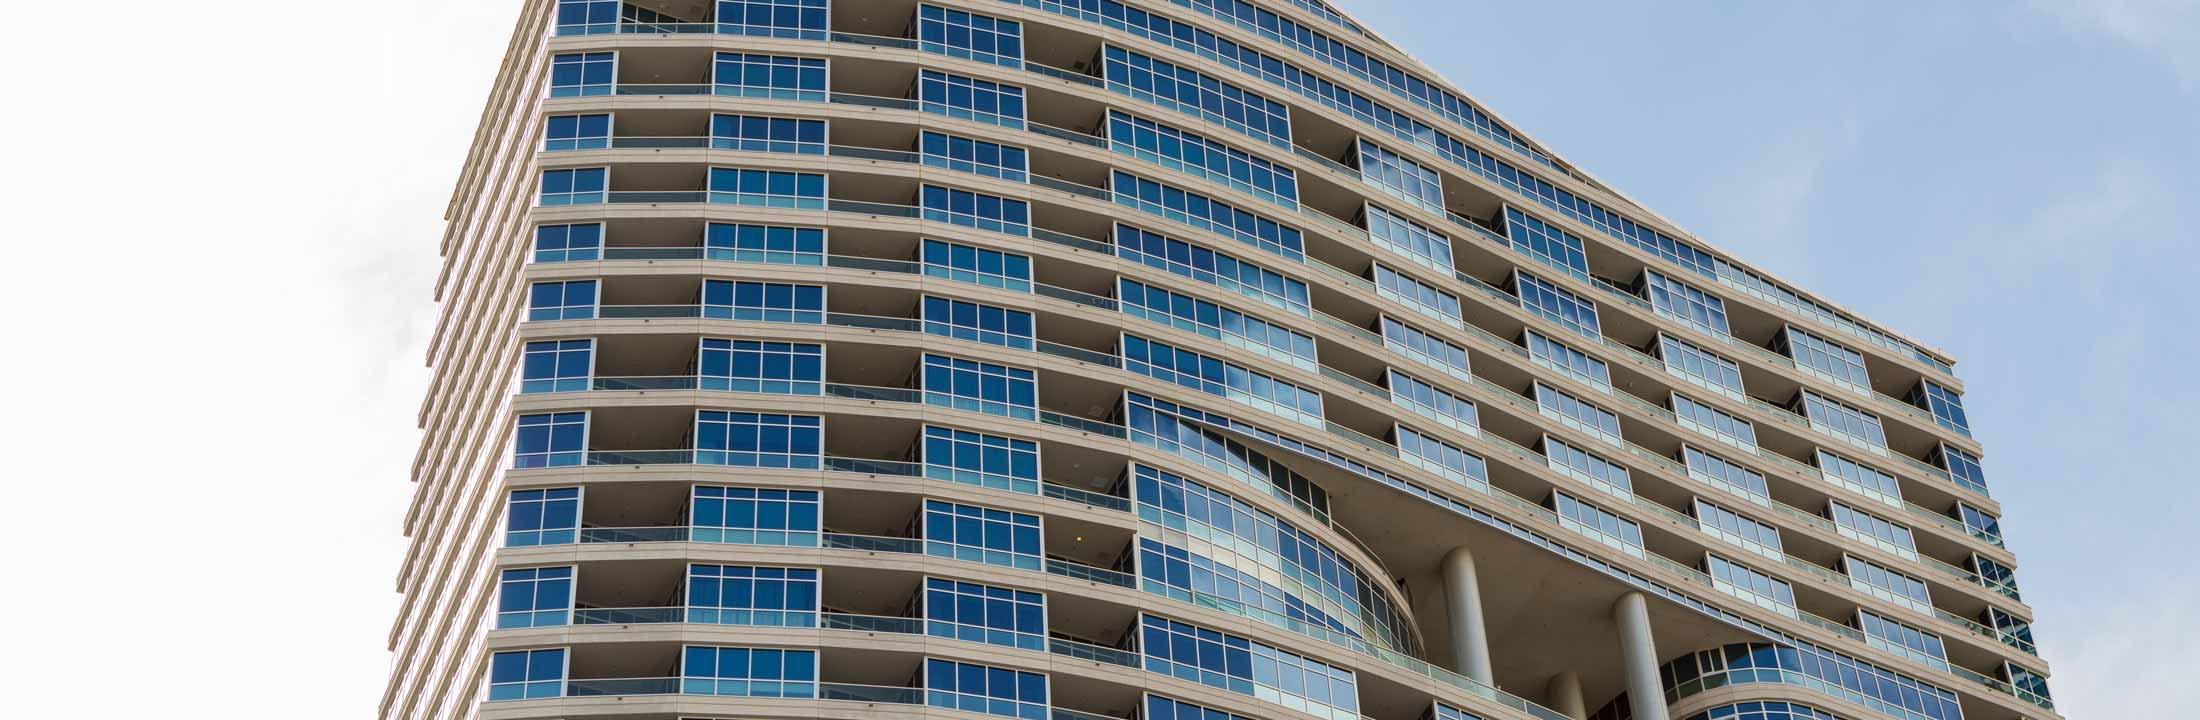 panorama-towers-condos-highrises-las-vegas-for-sale